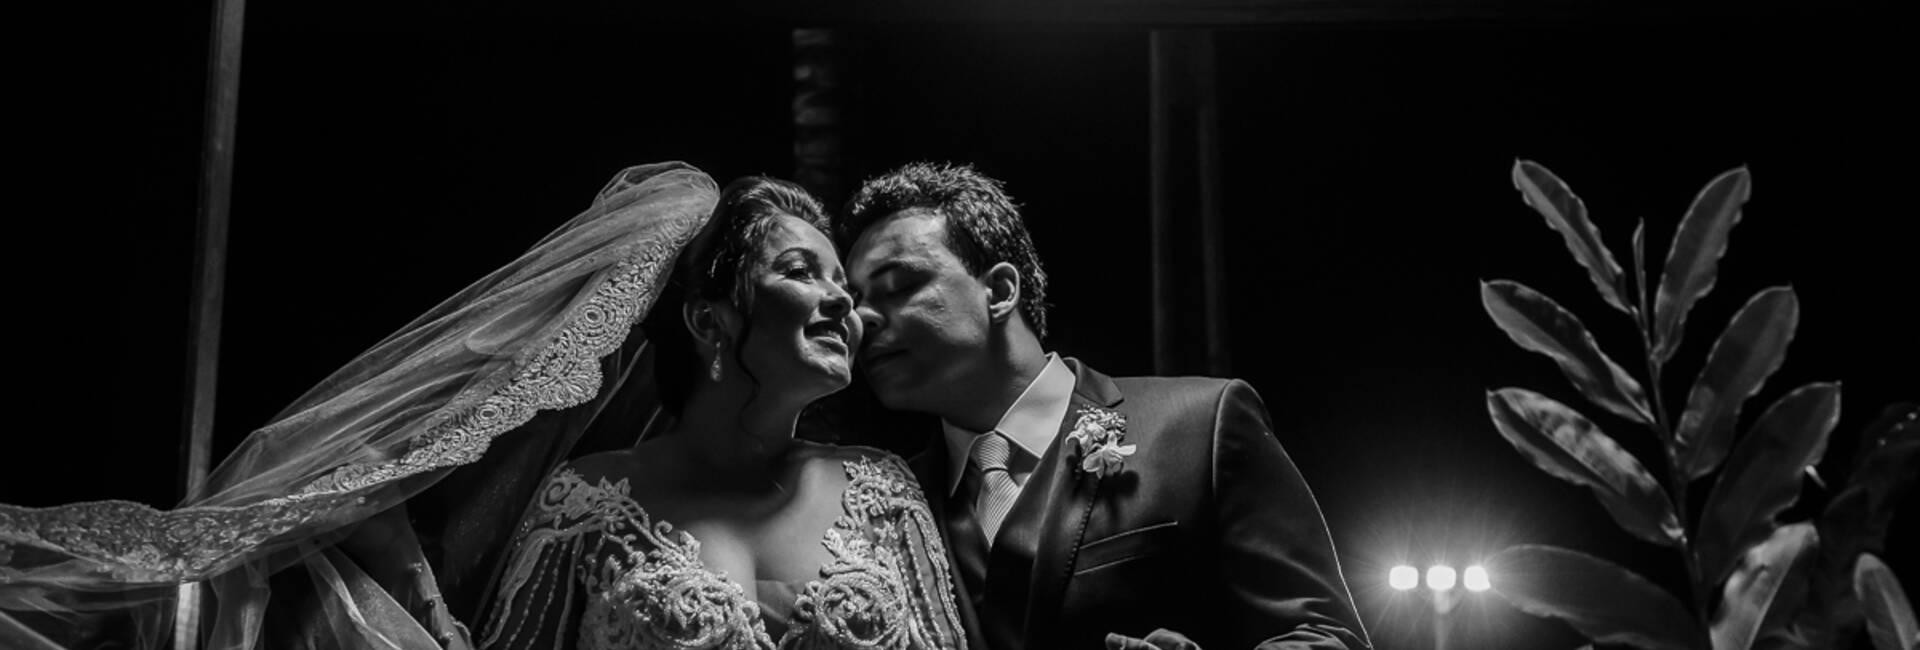 Casamento de Horrana e Raphael